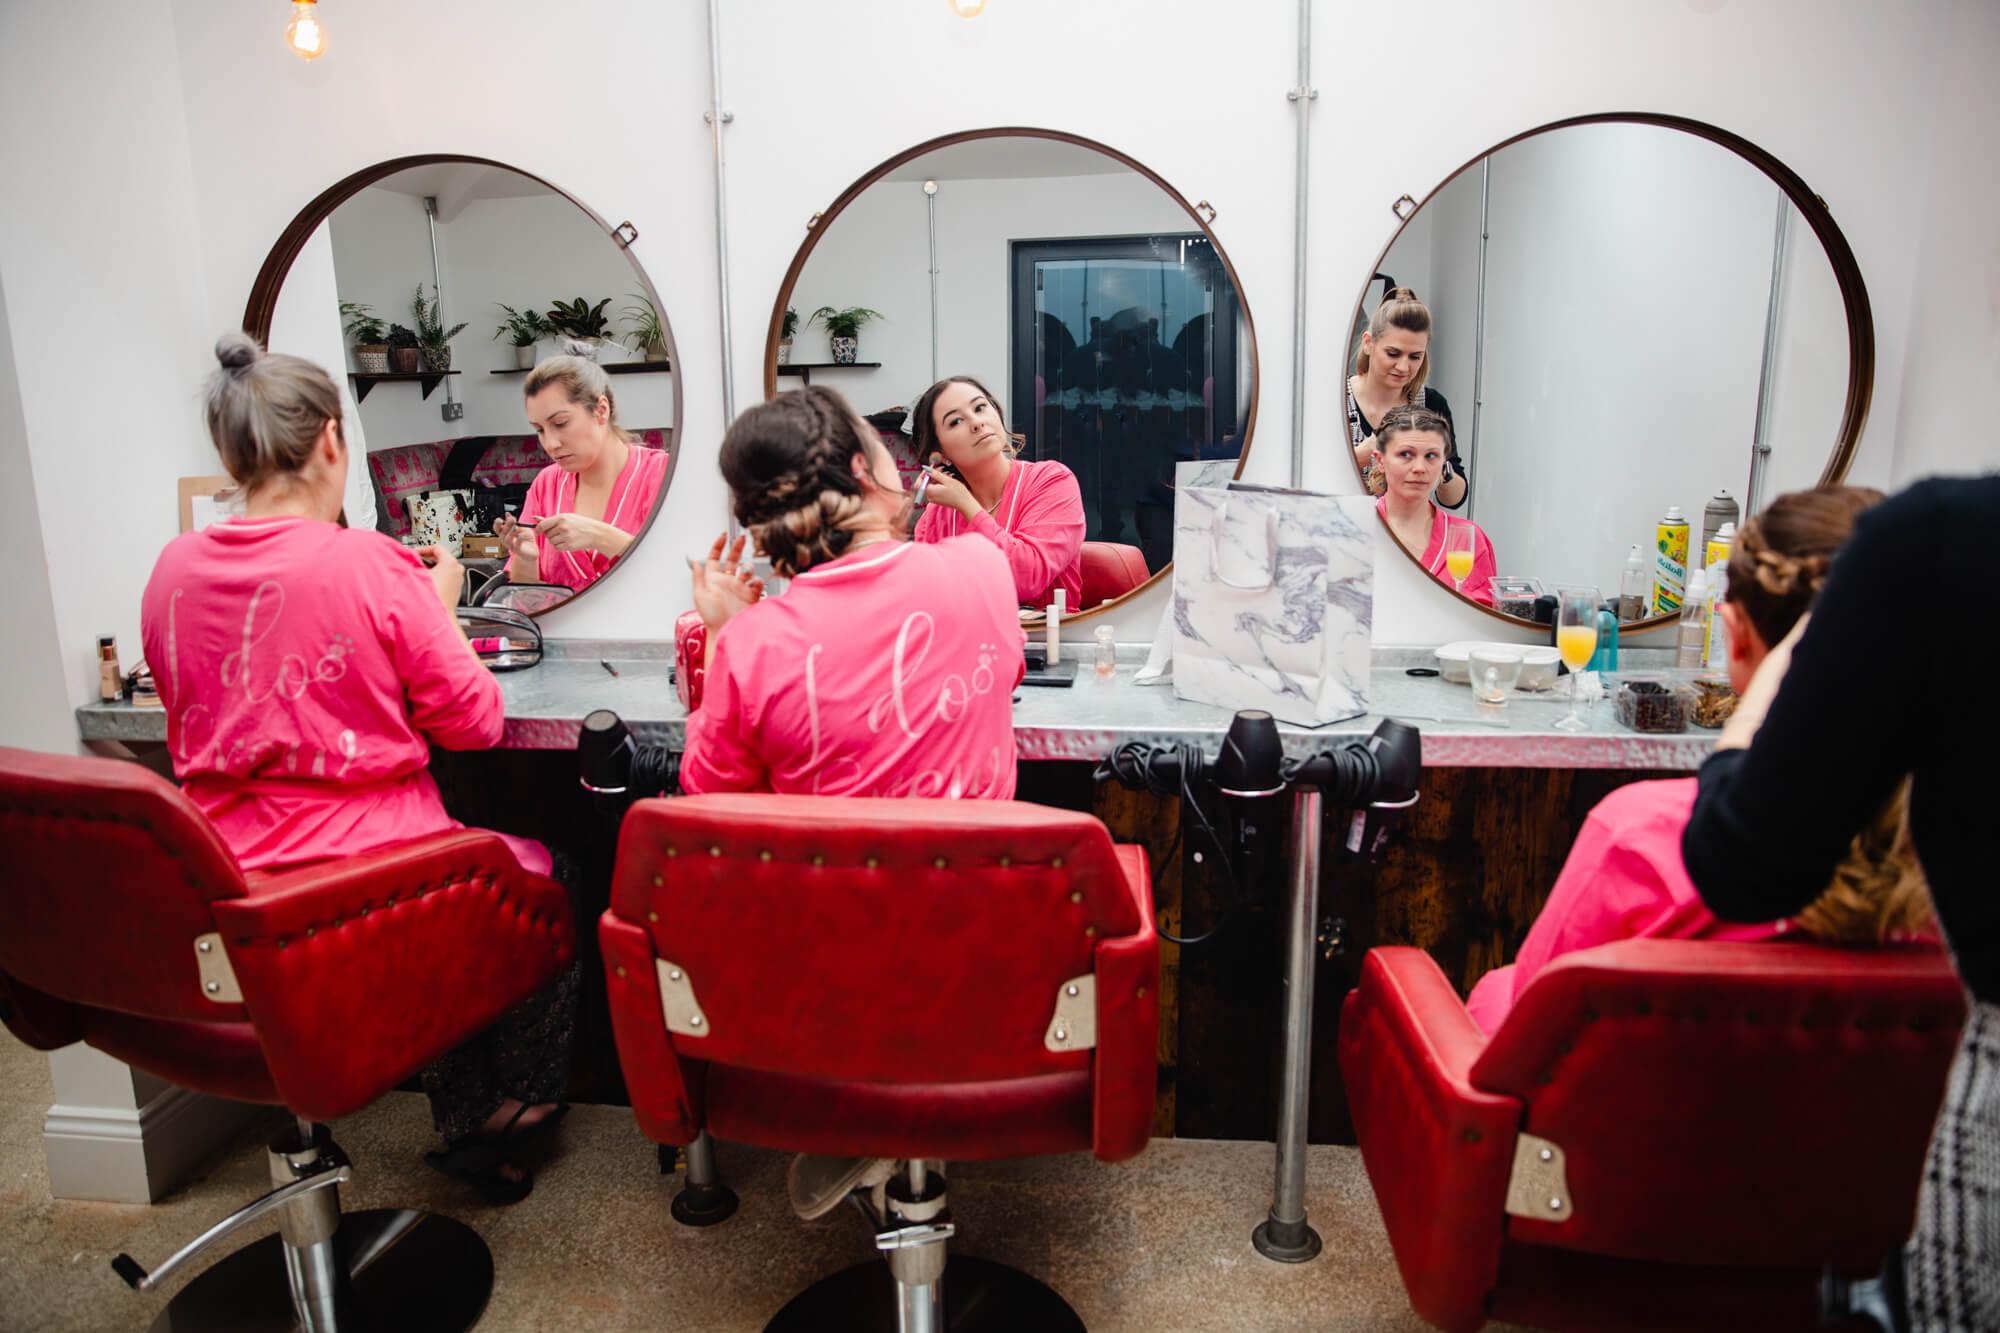 close up photograph of bridesmaids preparing make-up before wedding ceremony